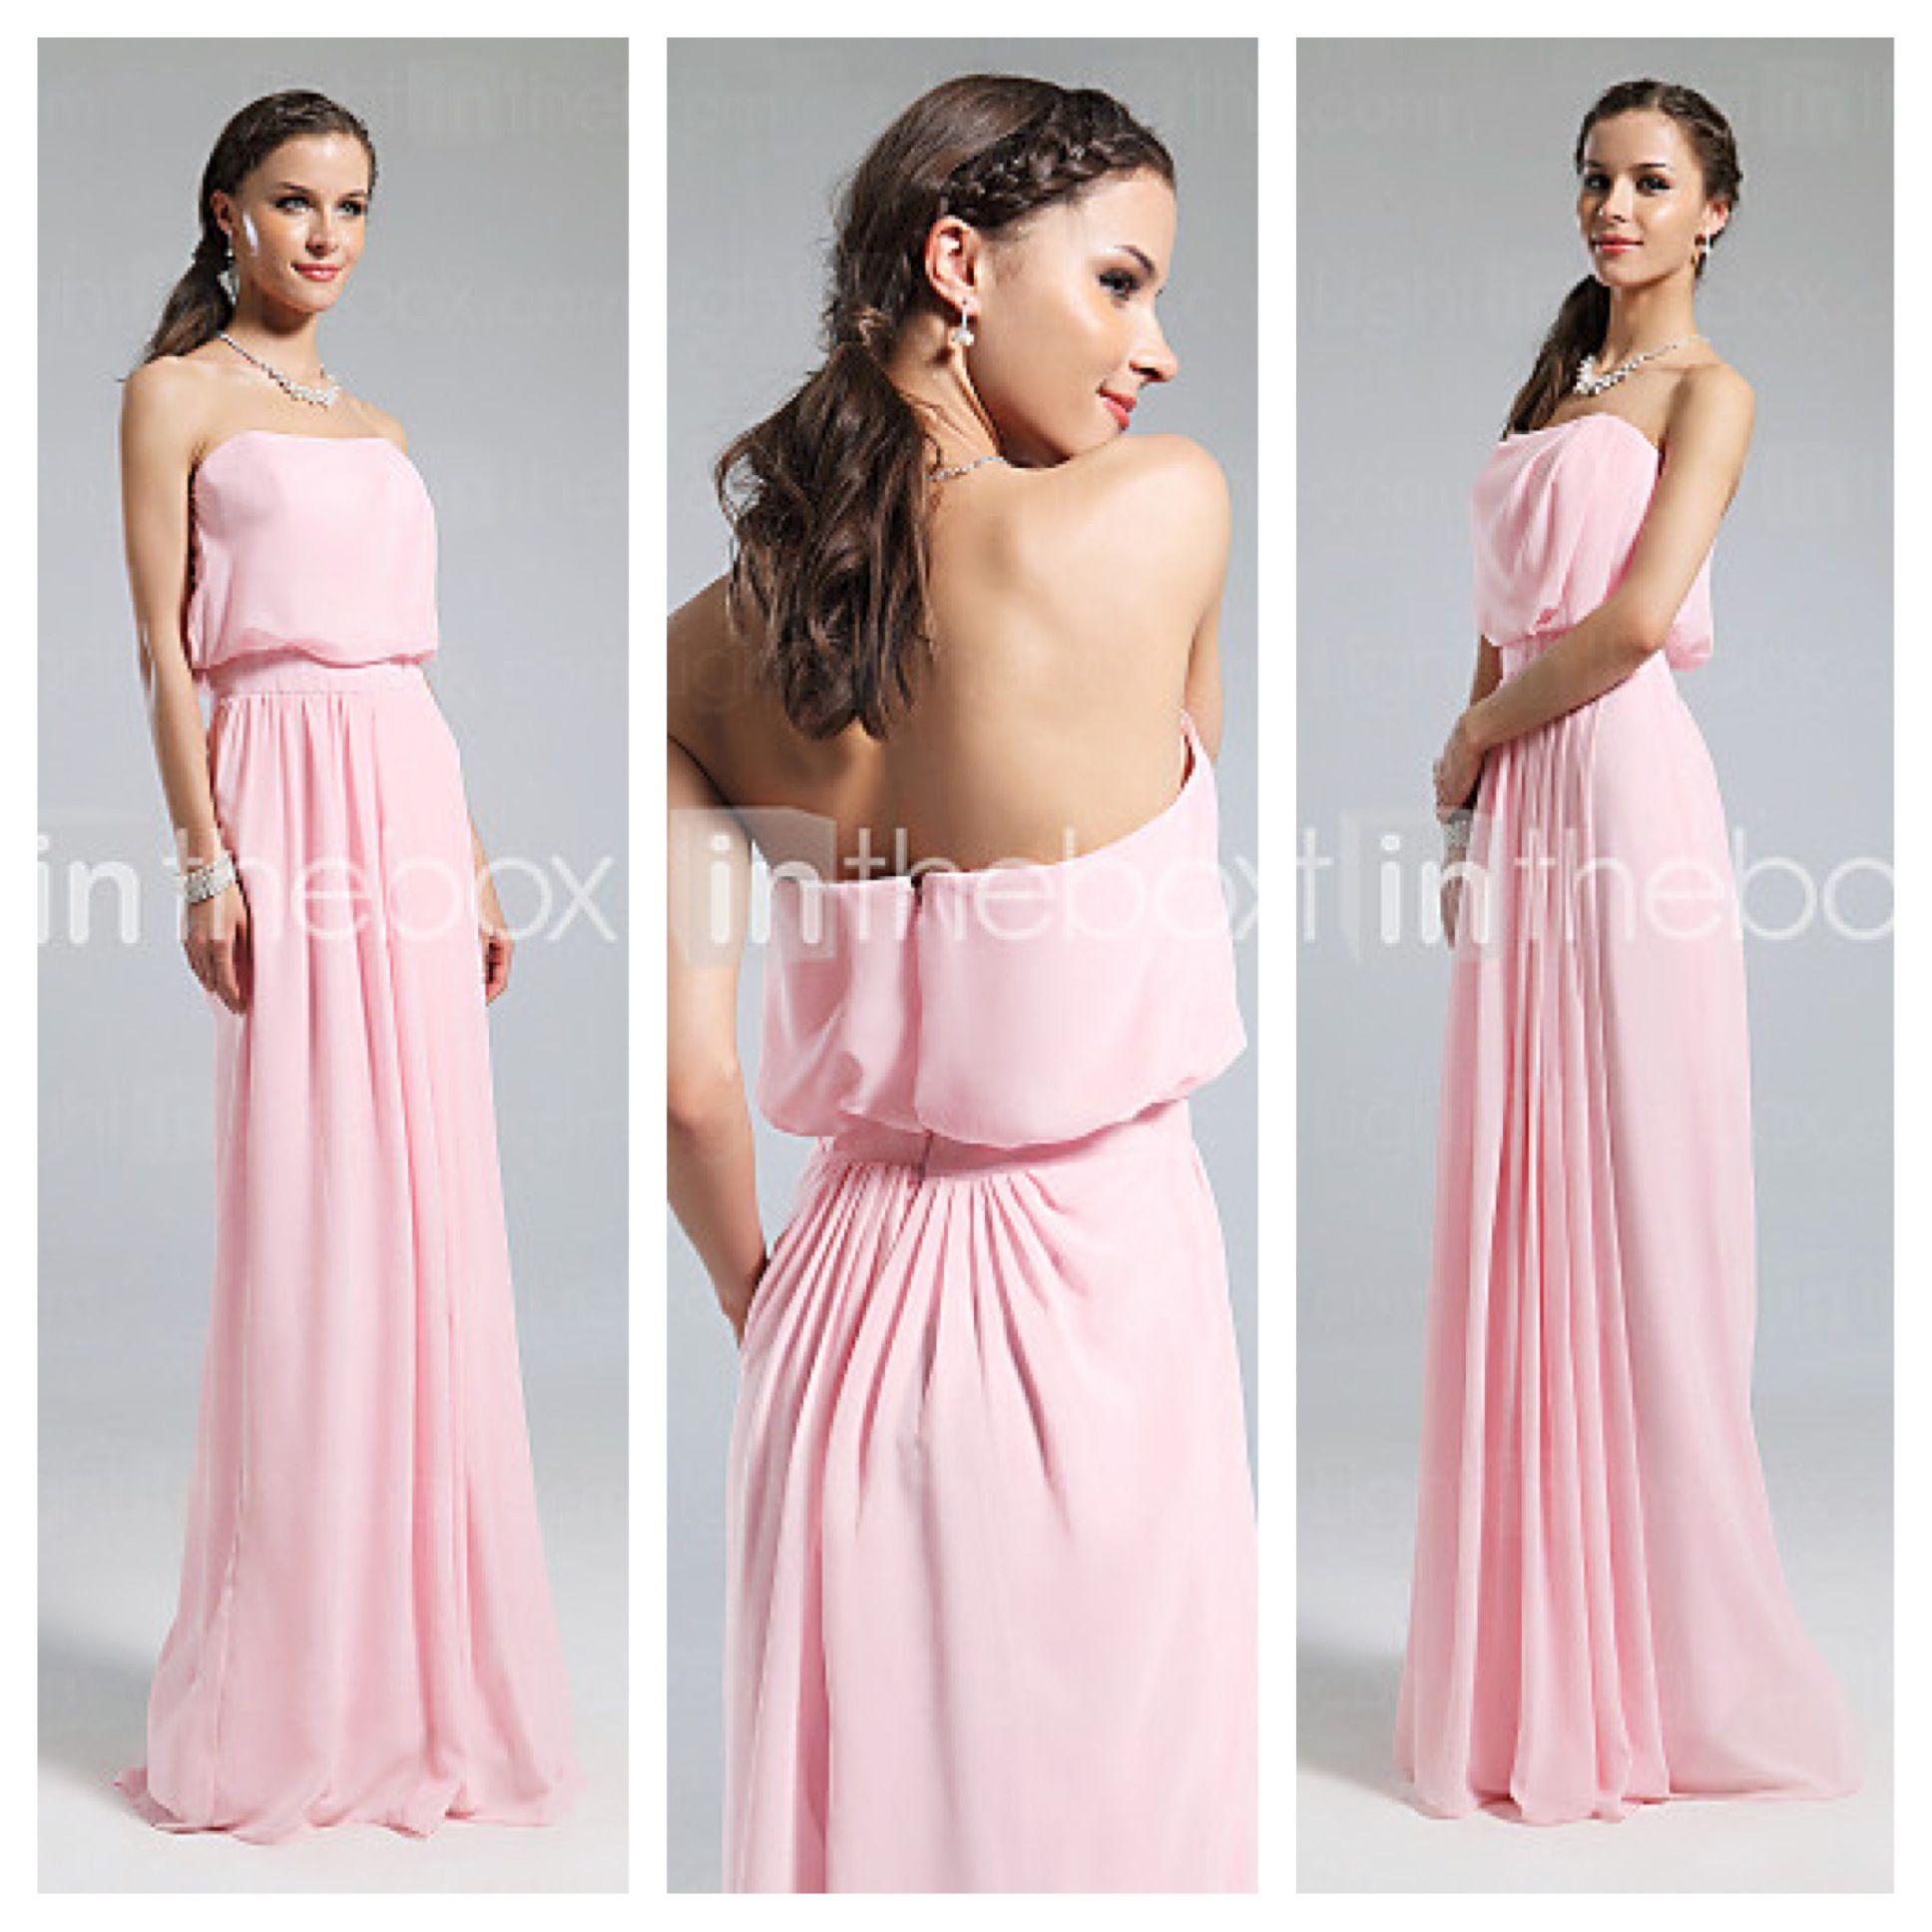 My junior senior dress my style pinterest